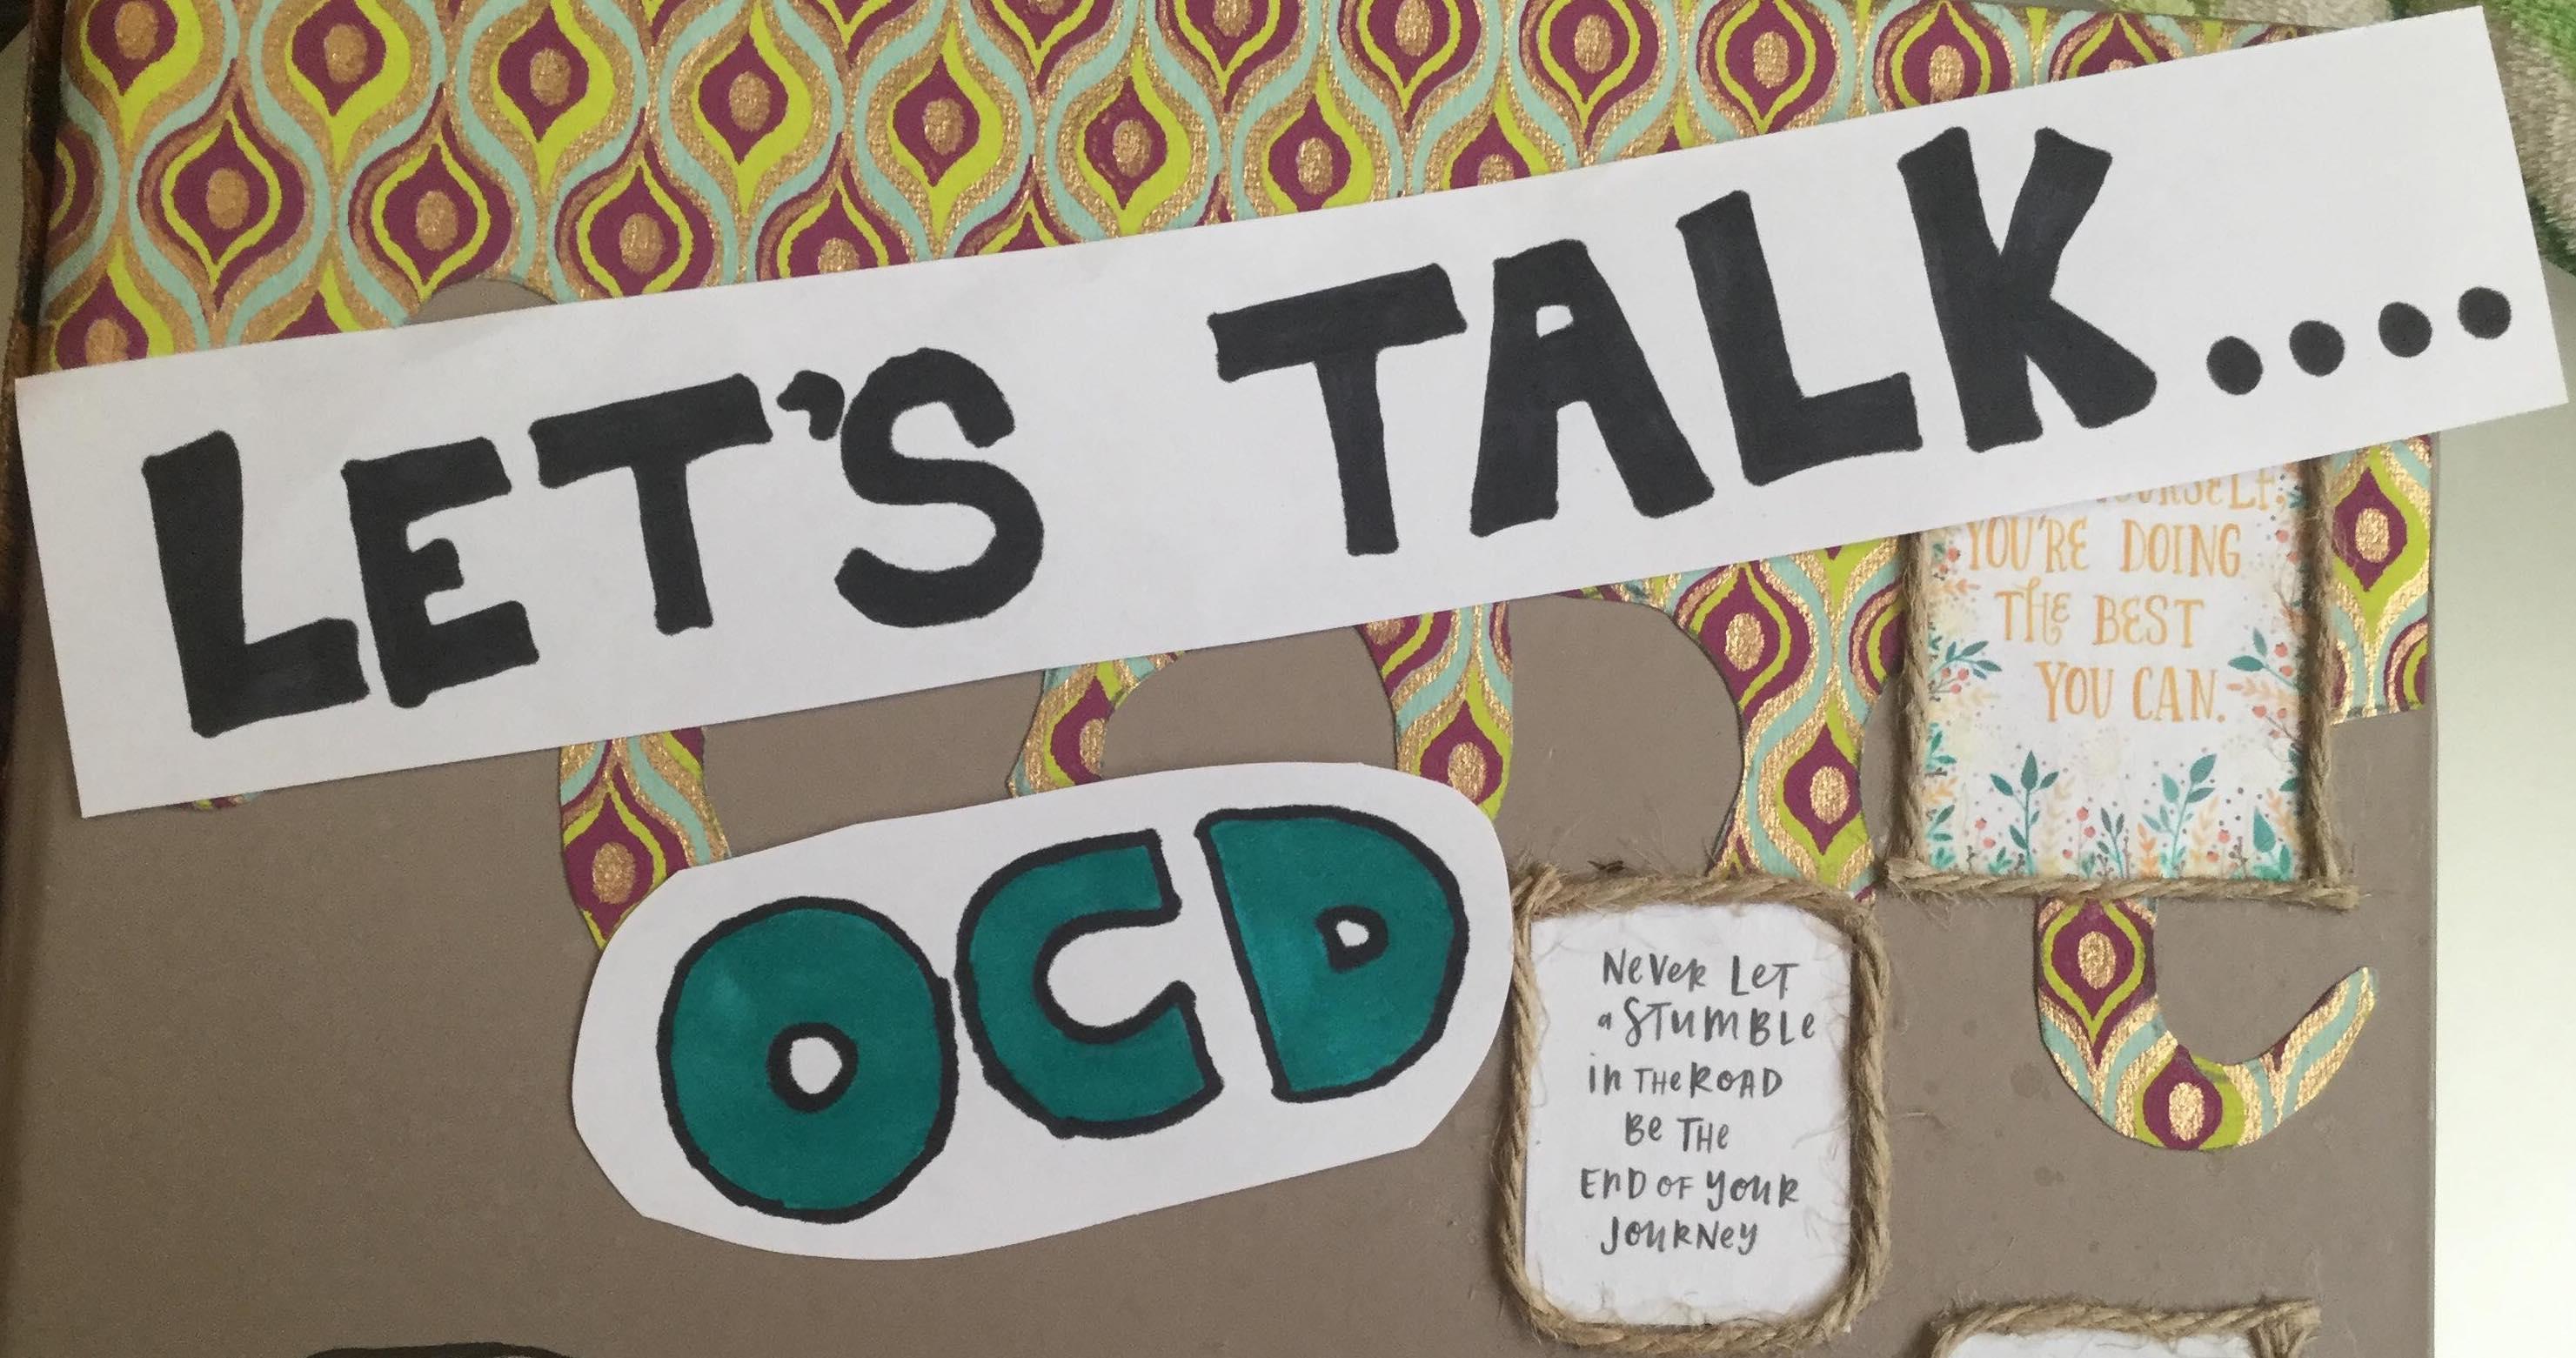 Madison : Ocd action sertraline